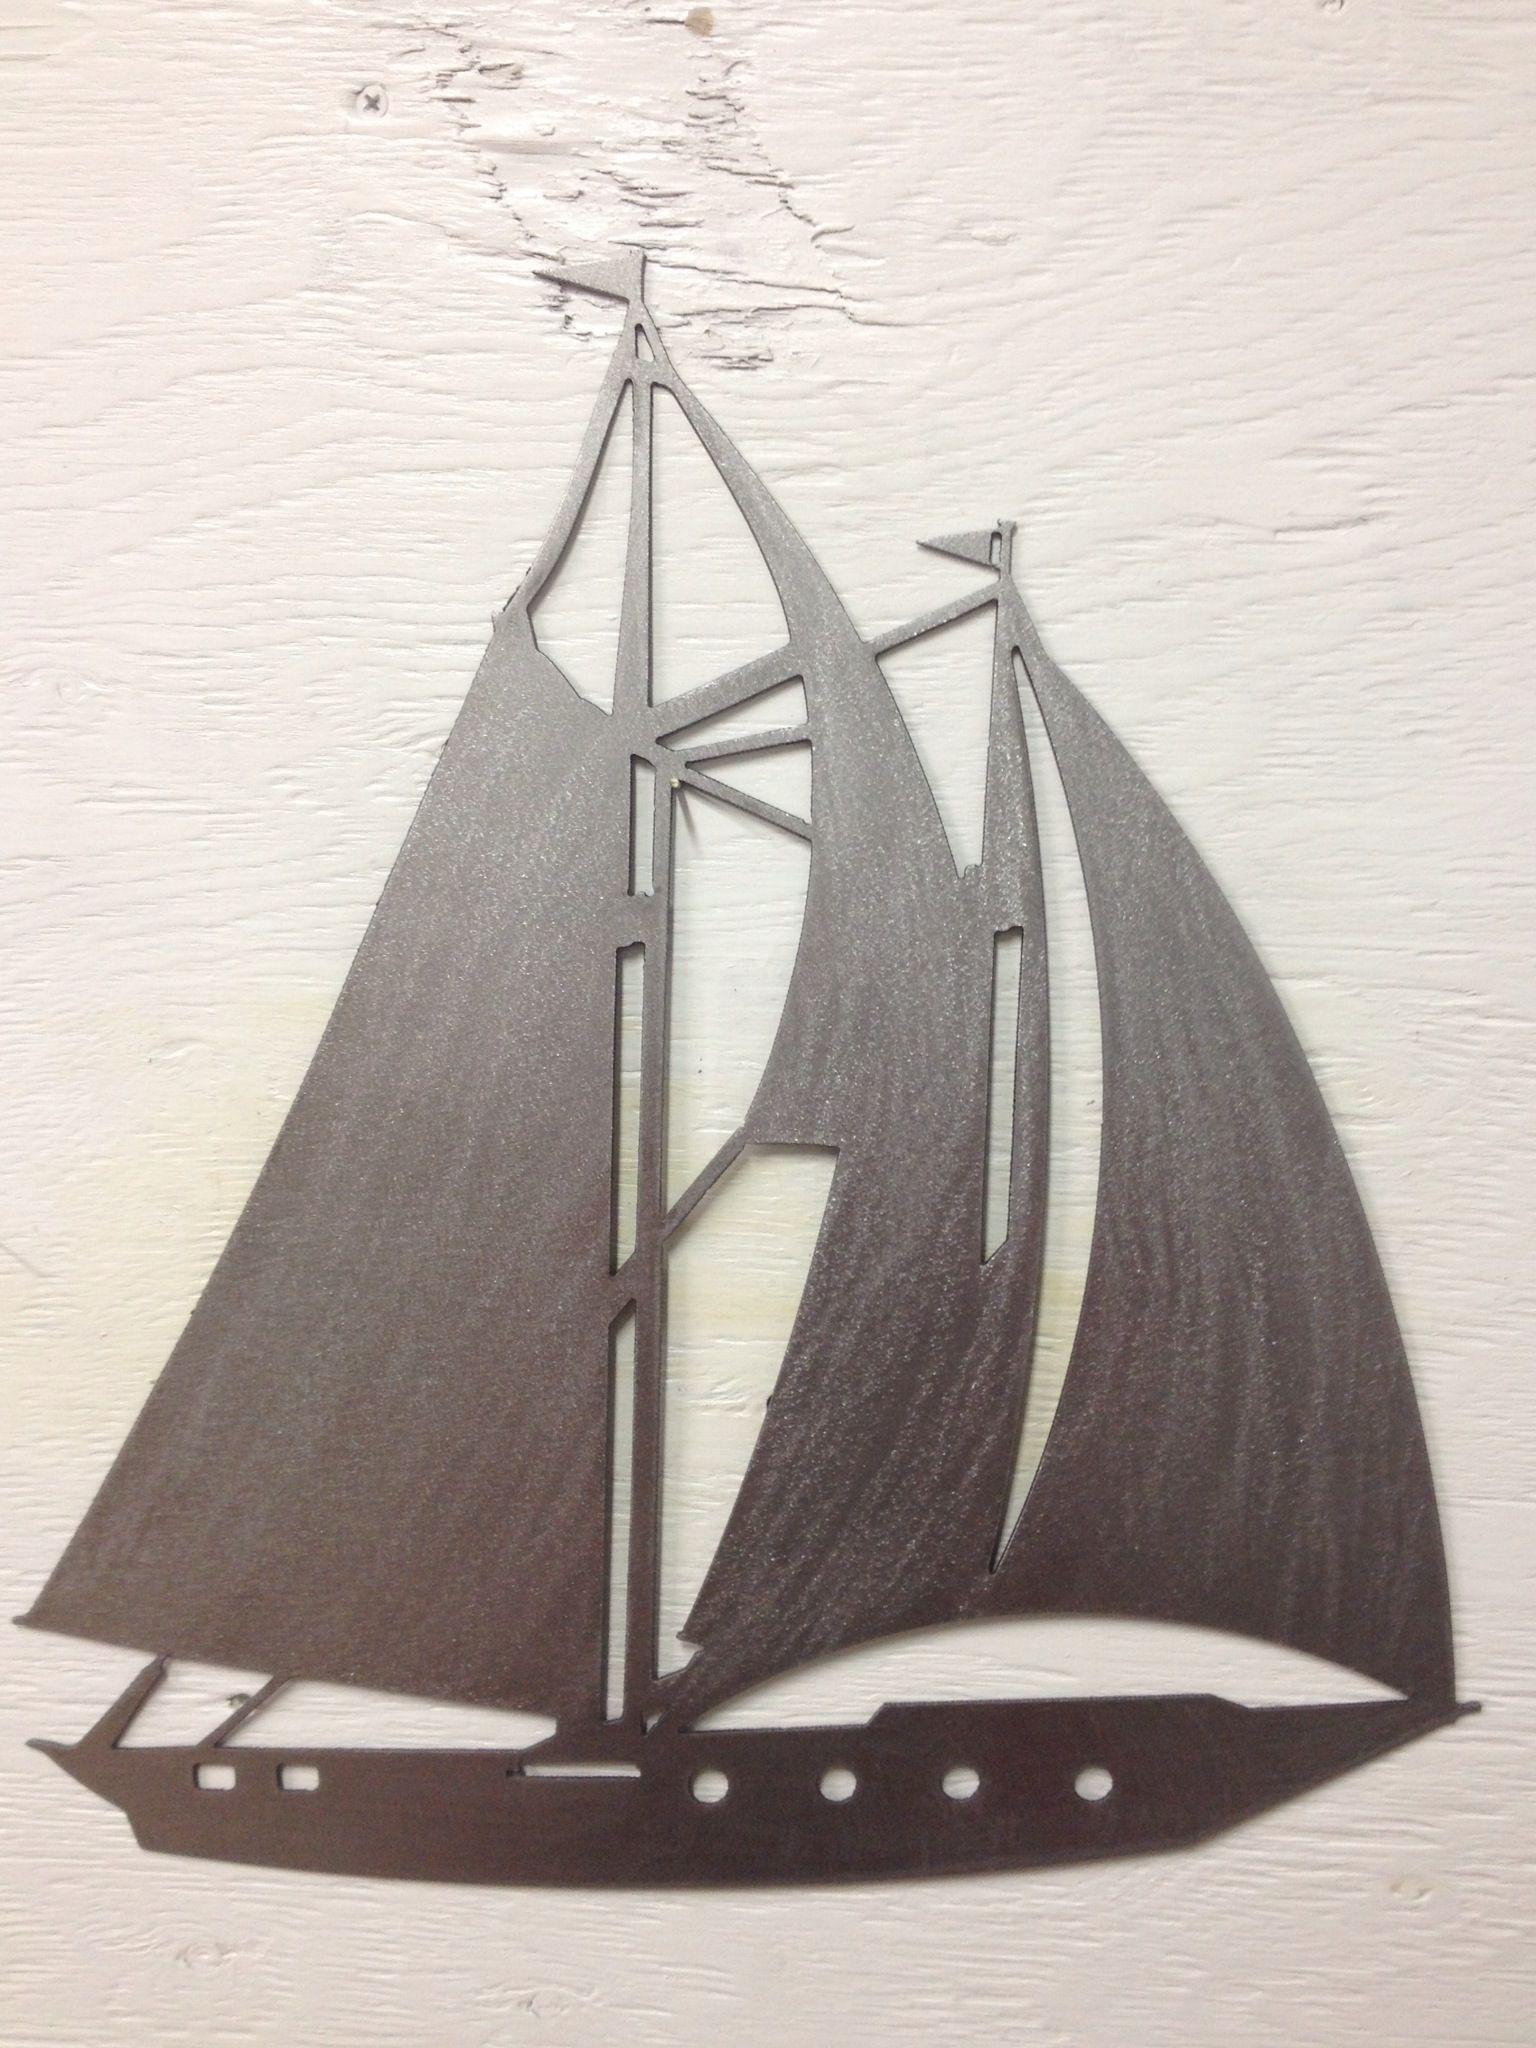 Sailboat Nautical Boats Ocean Fresh Water Salt Water Sails